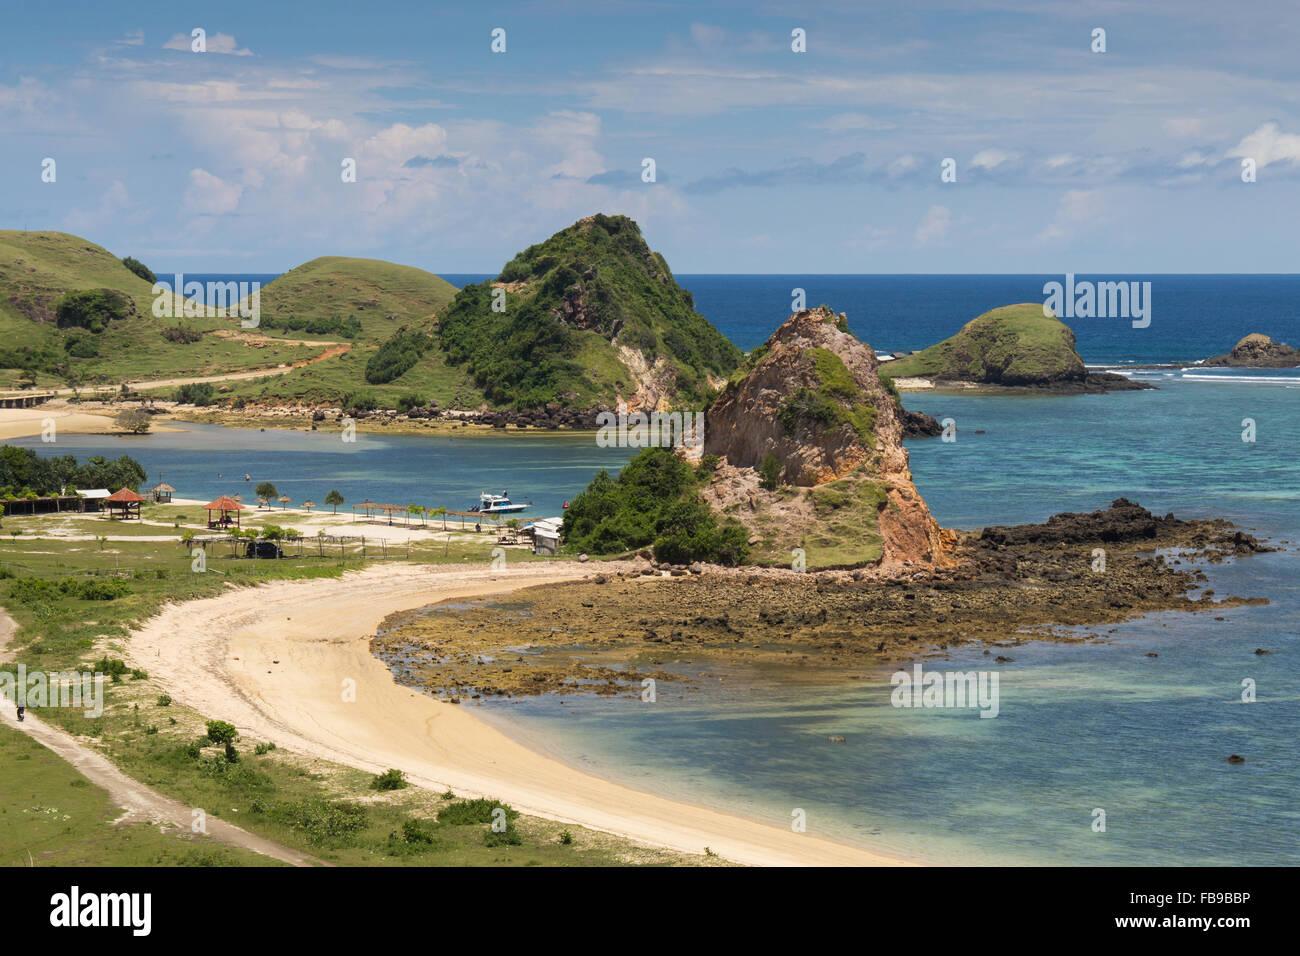 Pantai Seger I Lombok I Indonesia - Stock Image